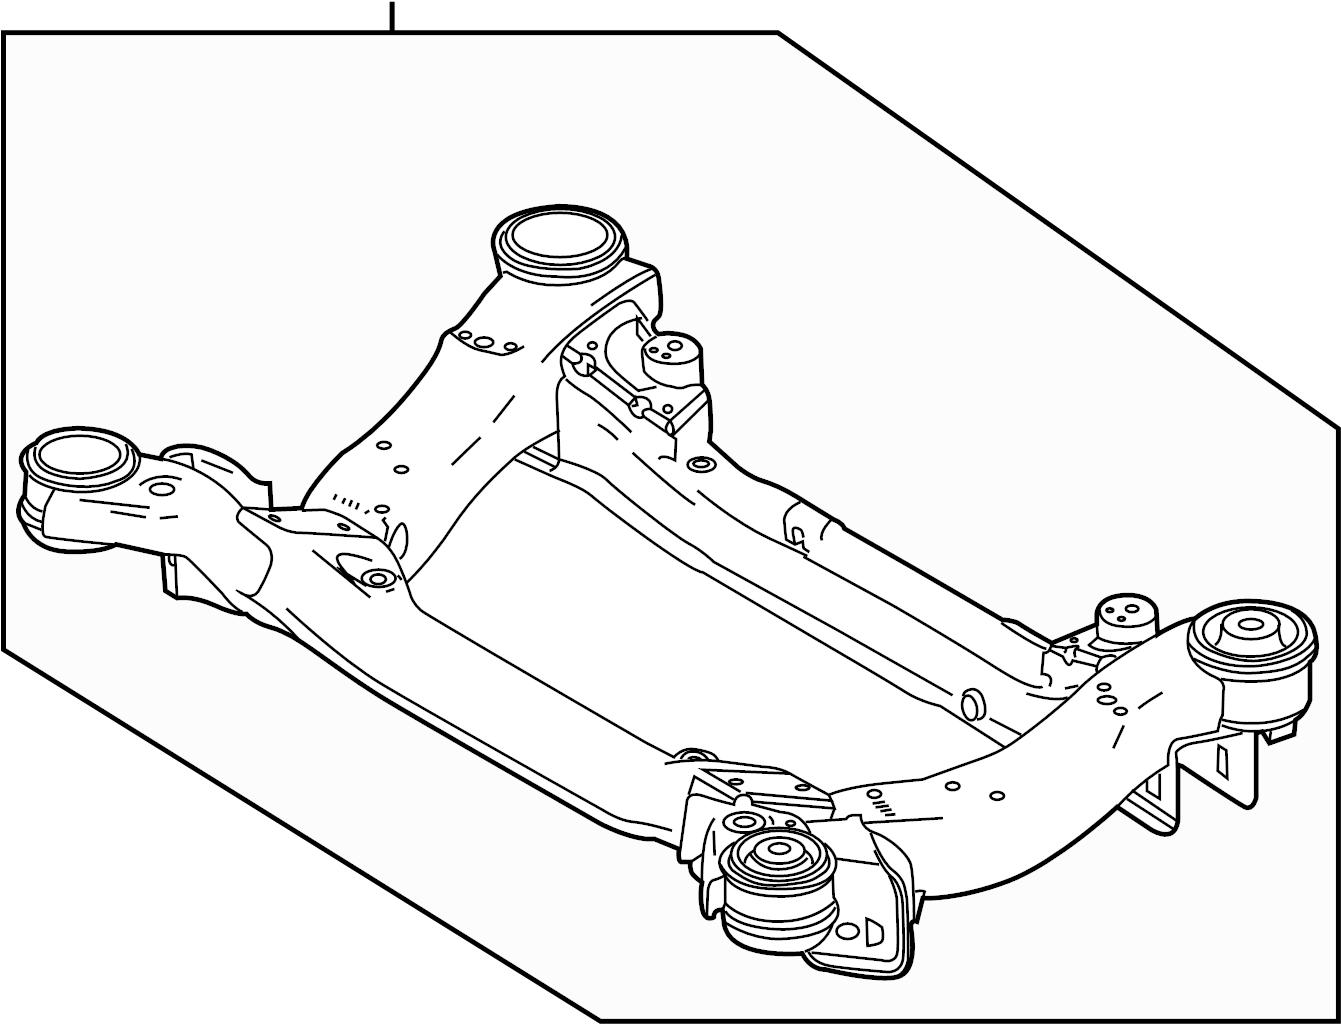 Jaguar Xjr Engine Cradle Front Suspension Crossmembers